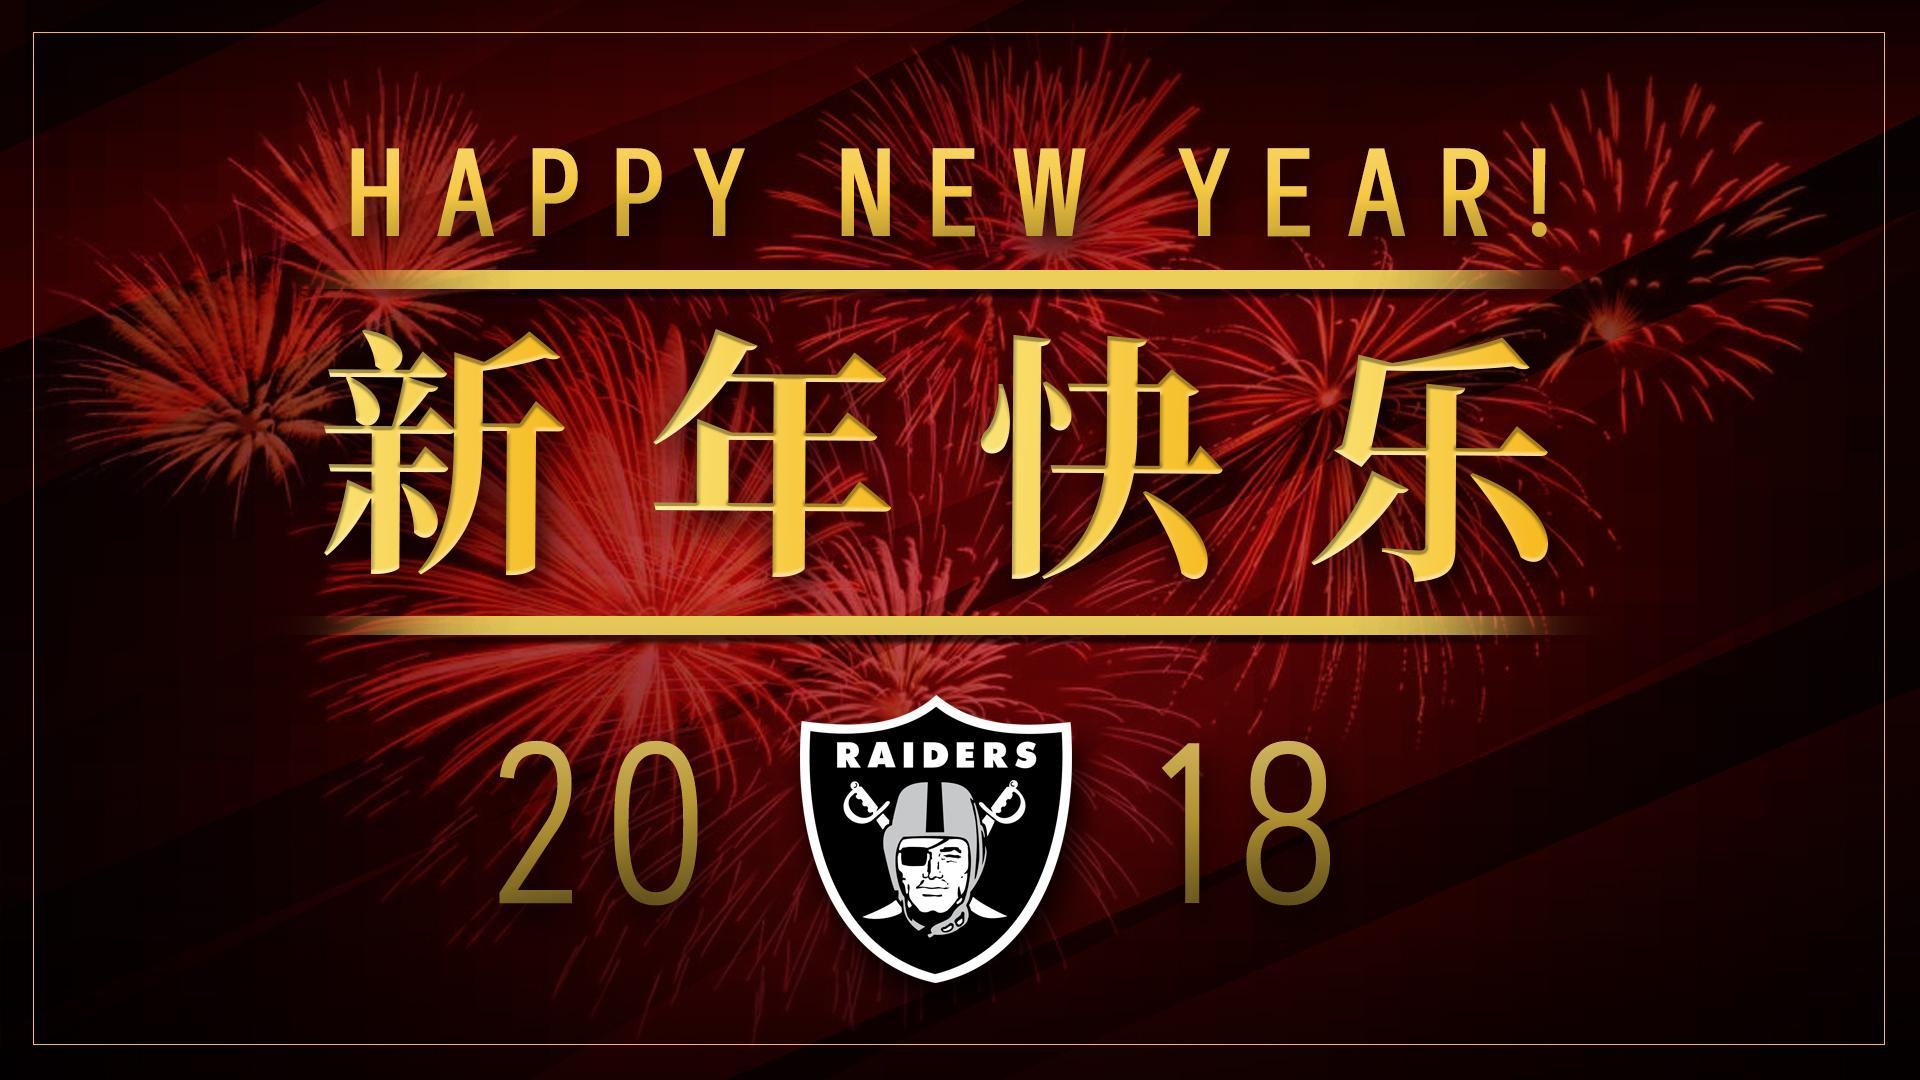 Happy Year of the Dog! 狗年快乐!  #LunarNewYear https://t.co/VCsTtNtnoo